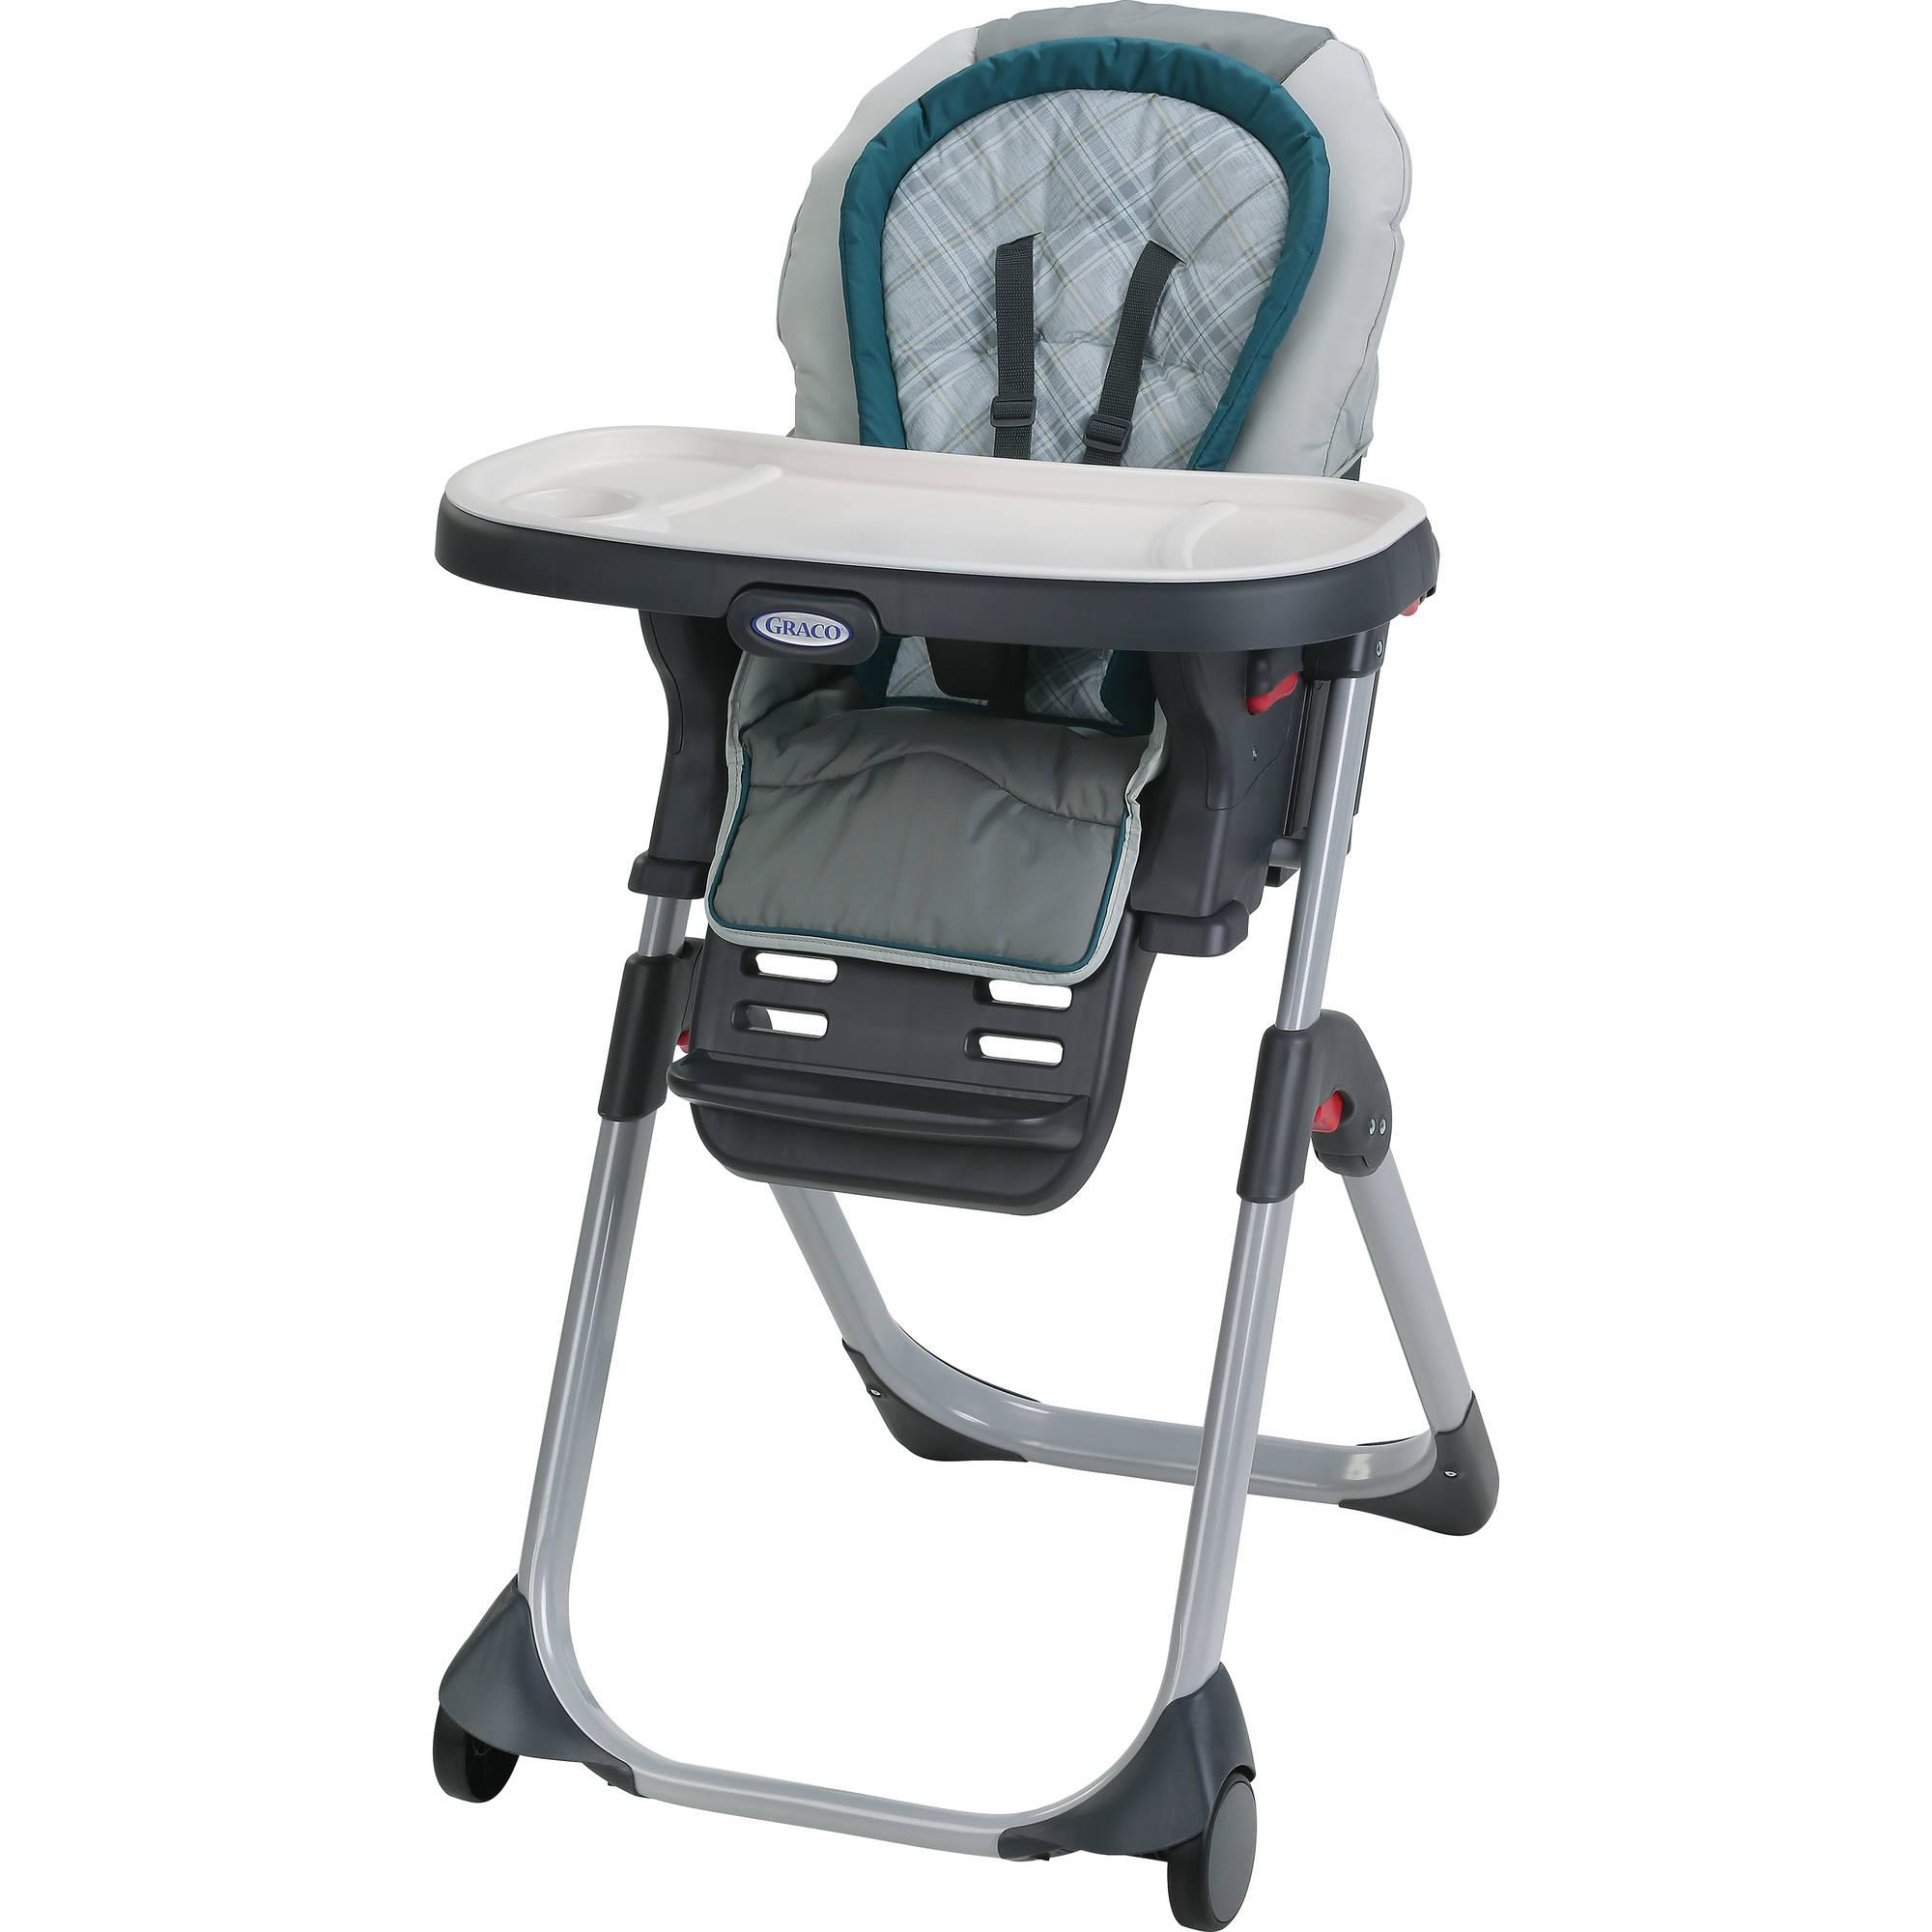 Walmart YMMV Graco DuoDiner 3-in-1 Baby High Chair - Luke - $49-$59